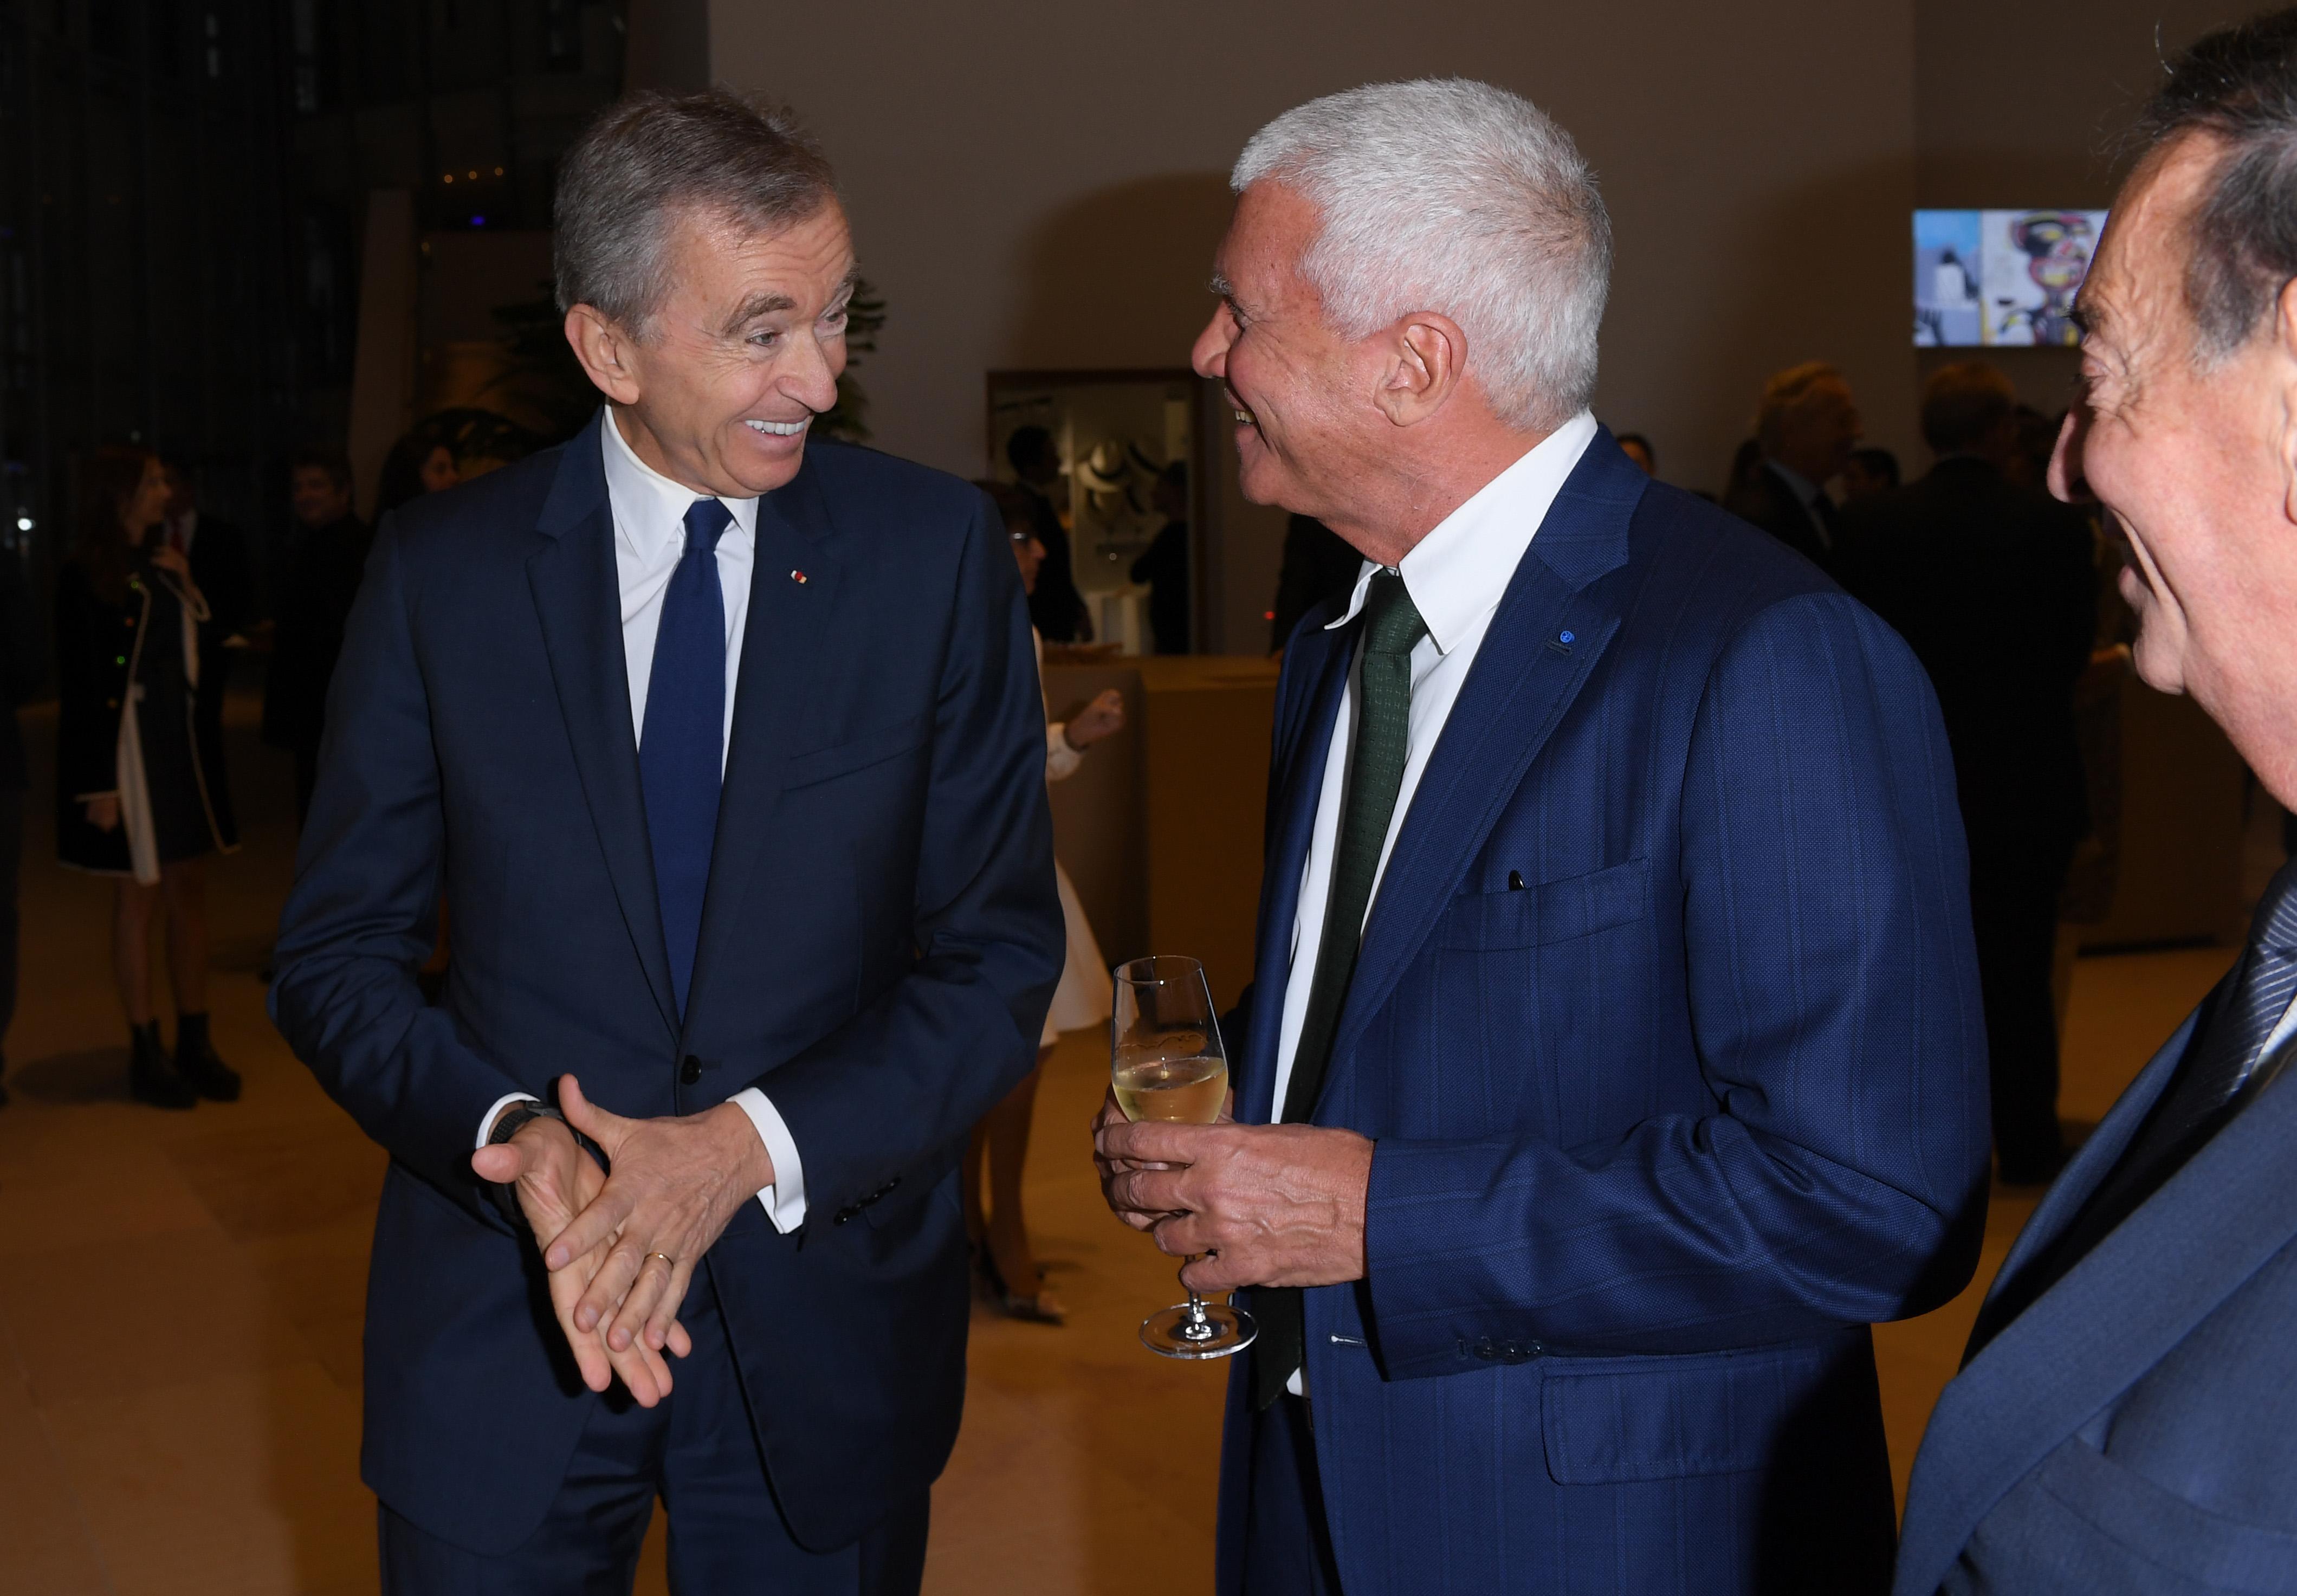 Bernard Arnault and Larry Gagosian